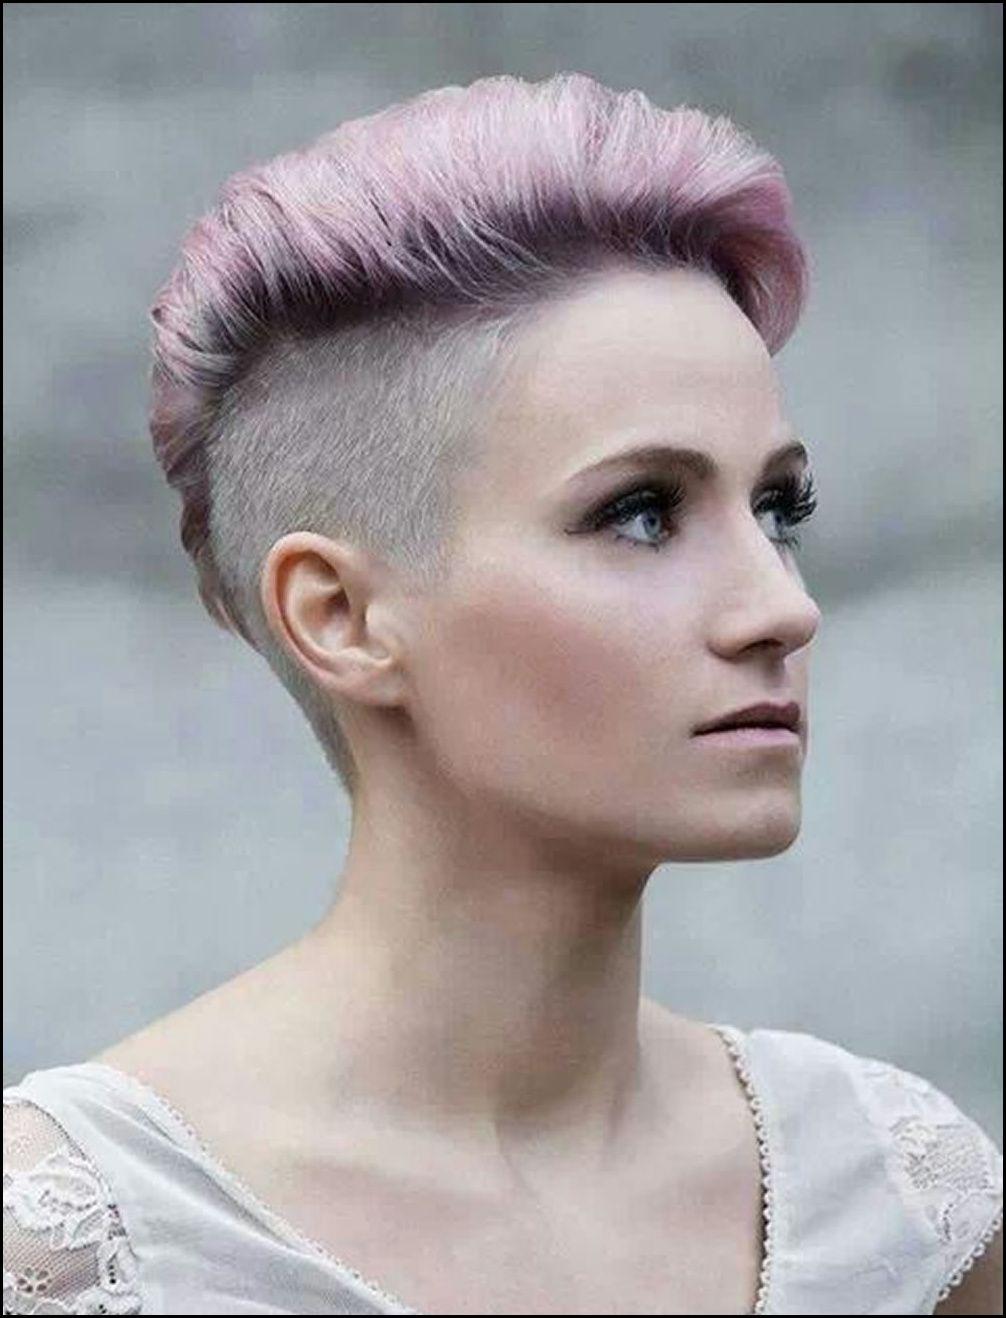 Einzigartige Mohawk Frisur Frauen Top Frisur Ideen Passen Zu Mir